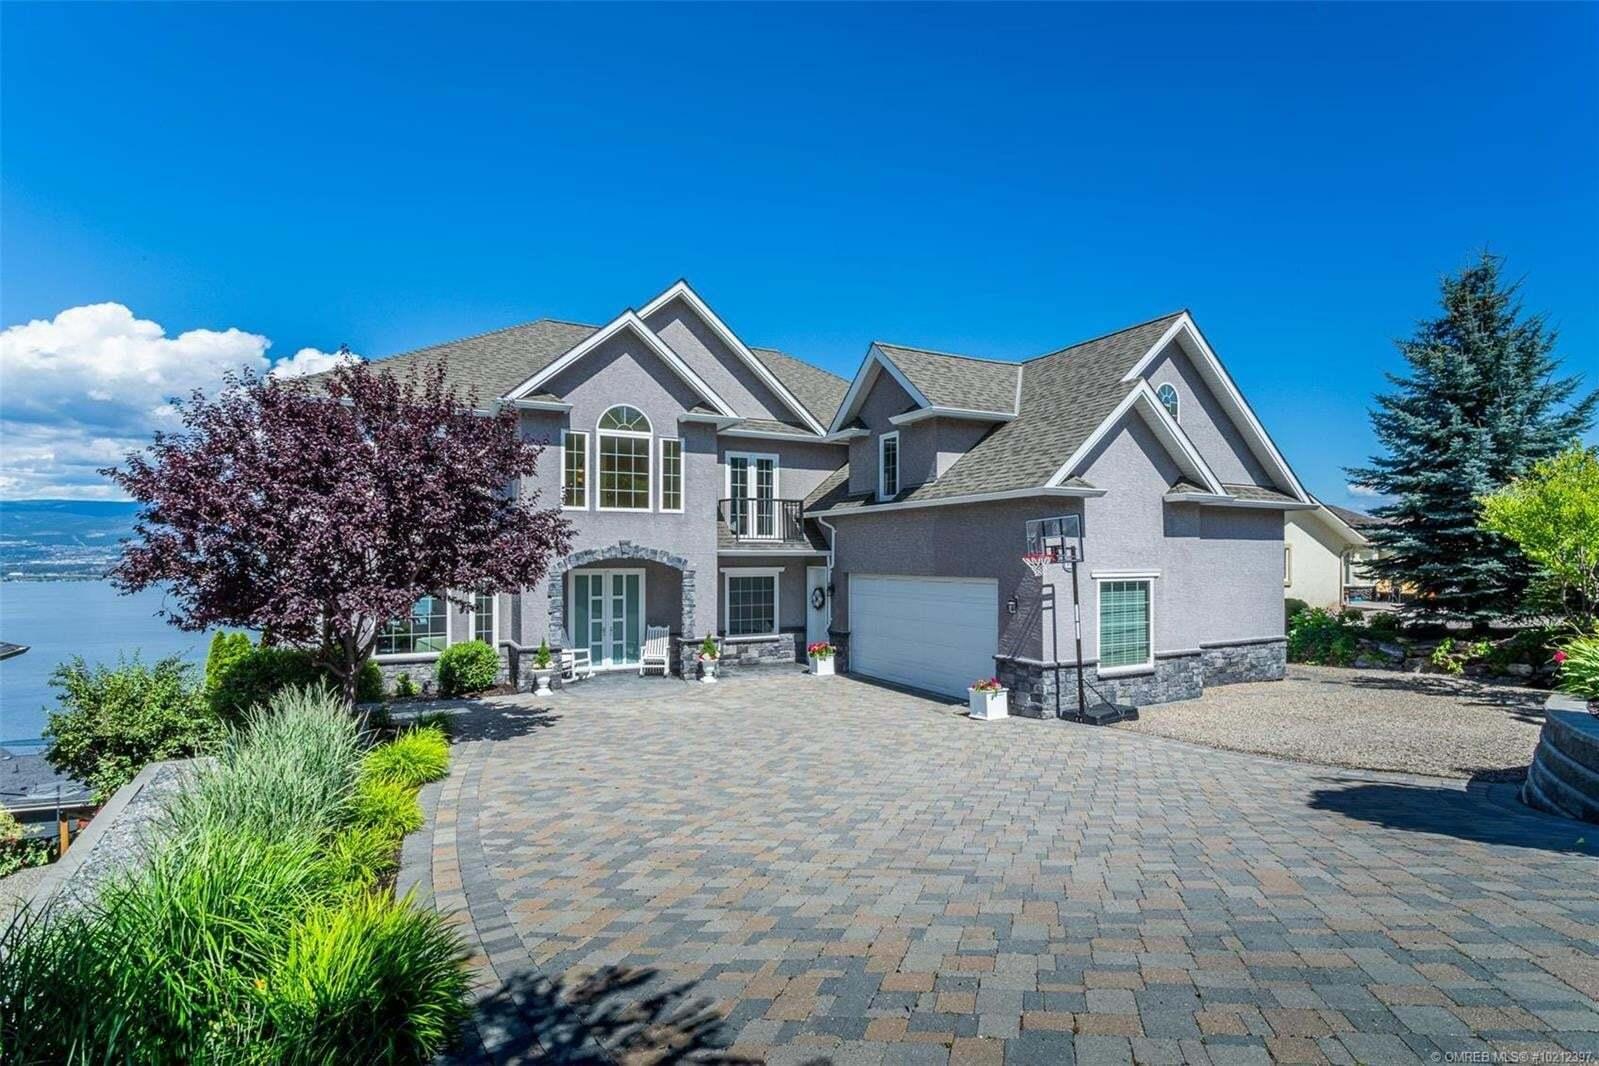 House for sale at 408 Okaview Rd Kelowna British Columbia - MLS: 10212397